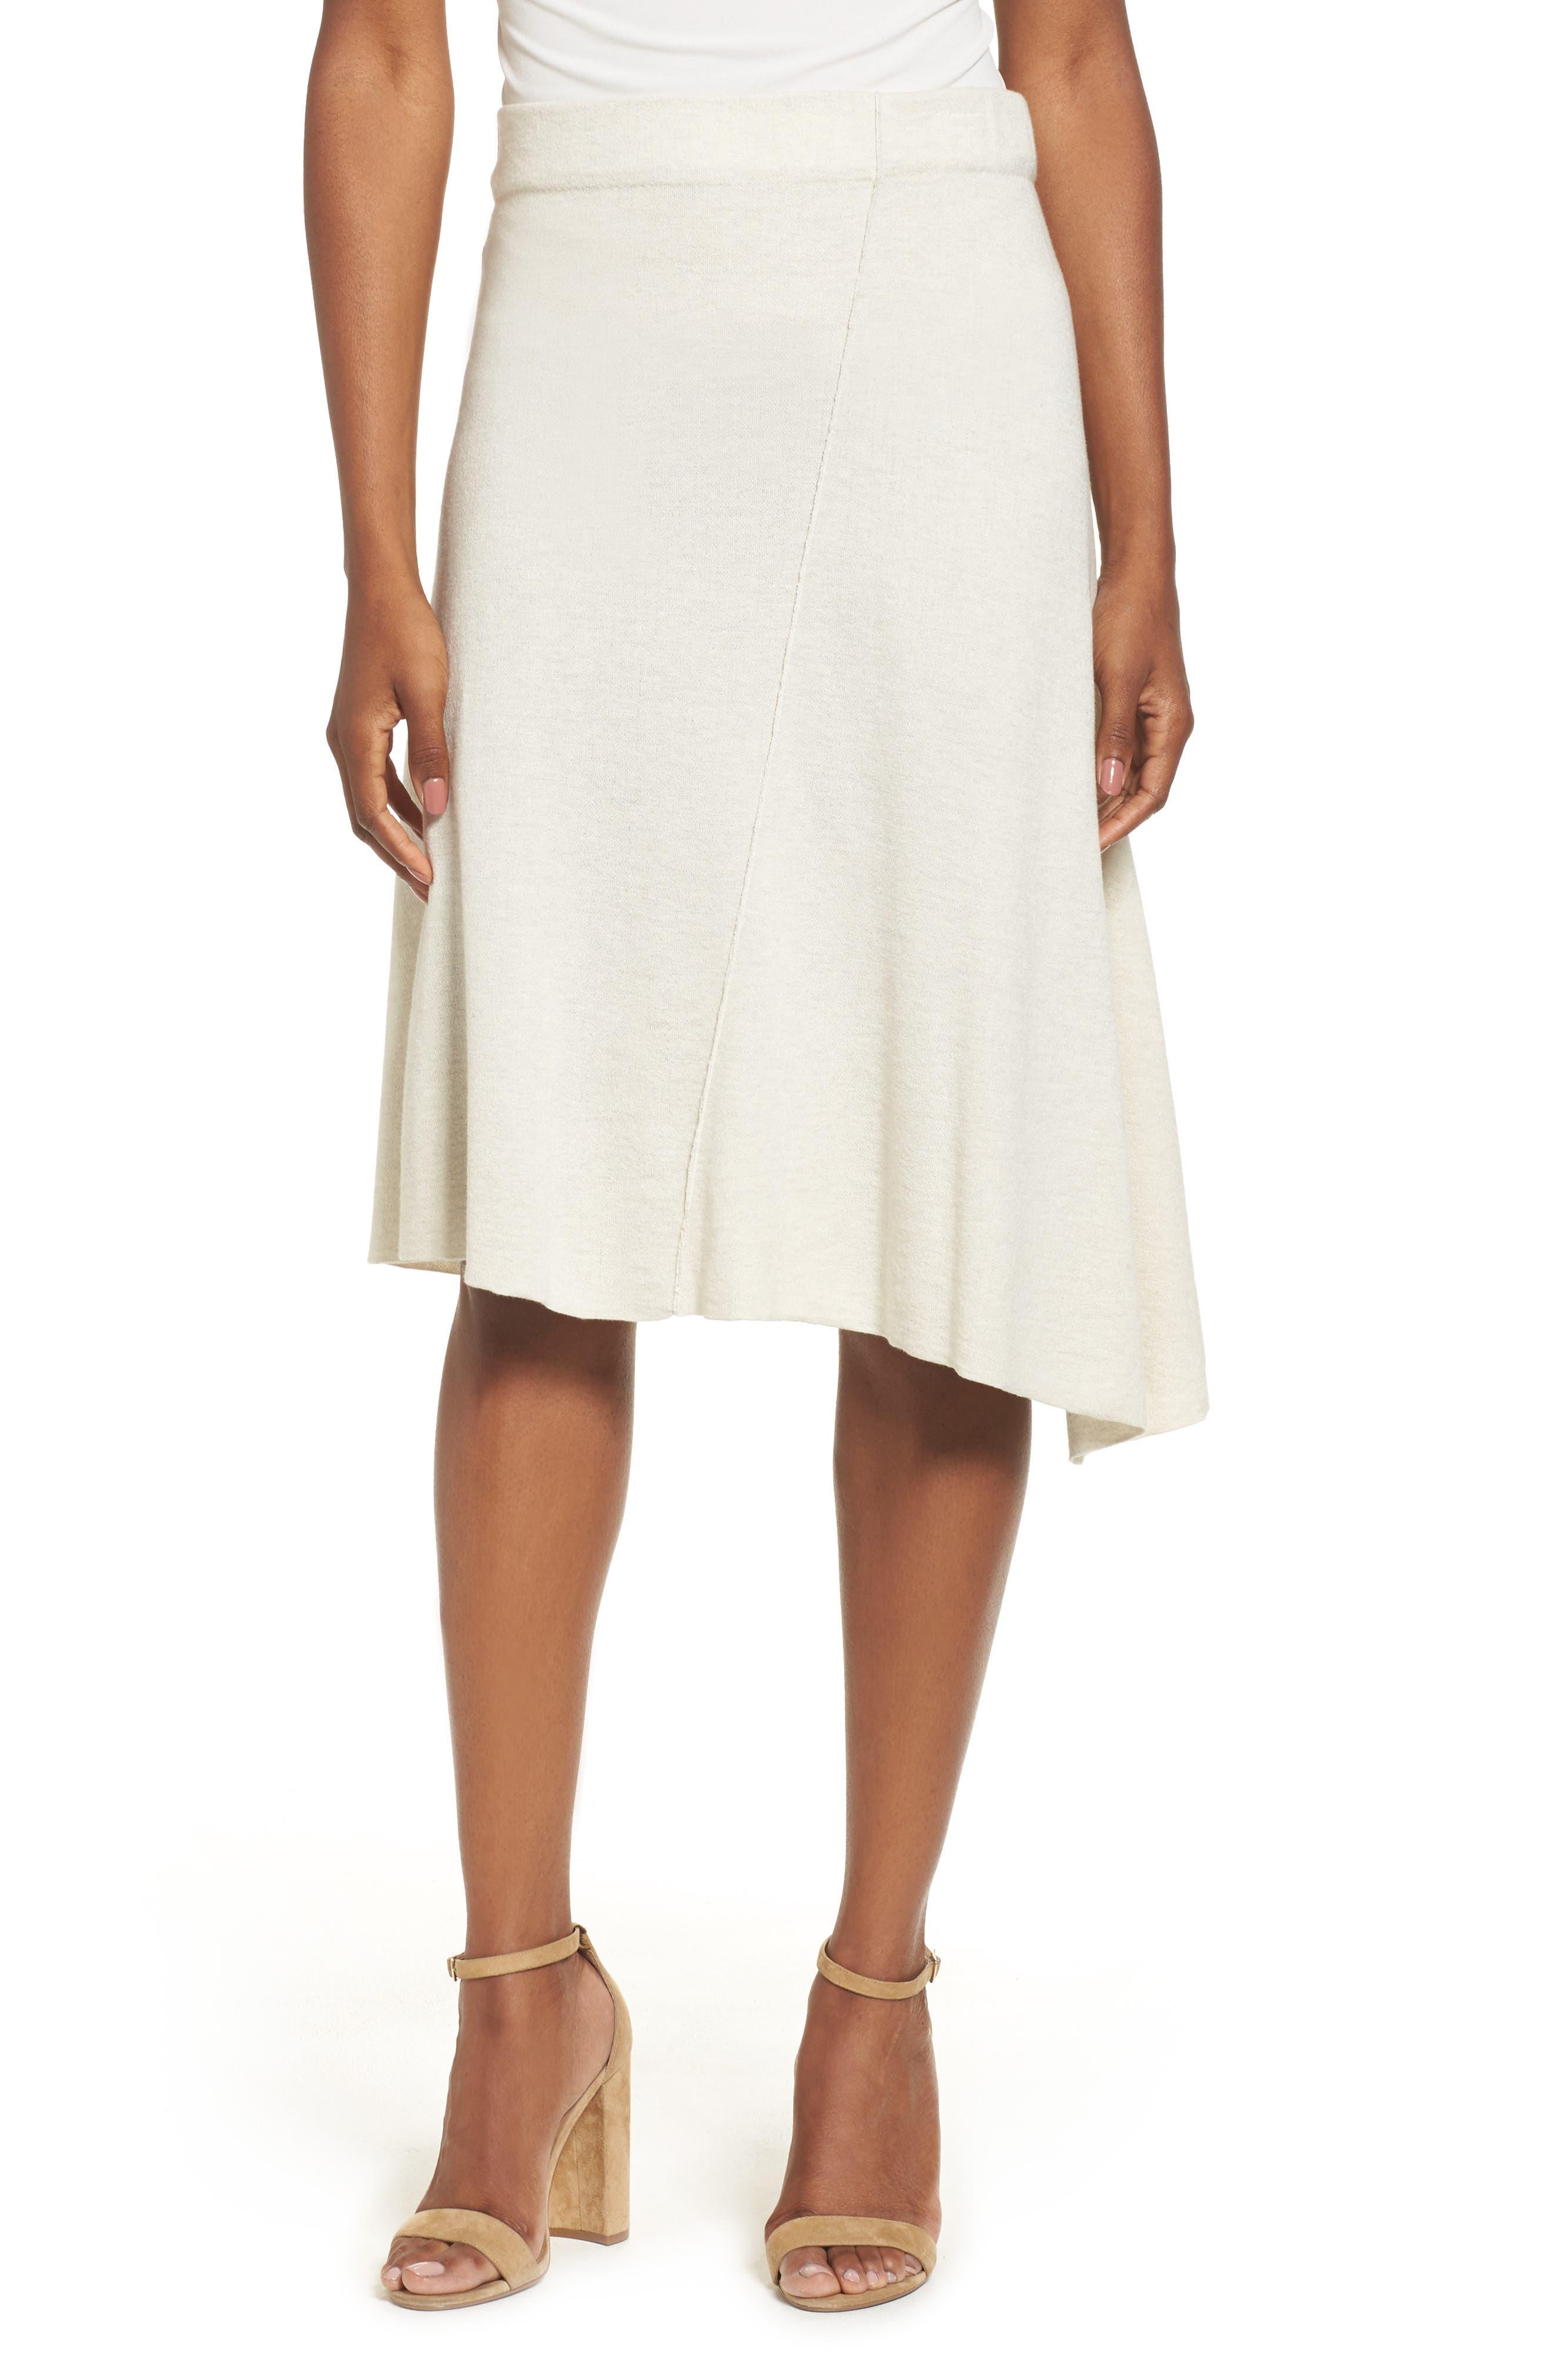 Alternate Image 1 Selected - NIC+ZOE Mod Twirl Skirt (Regular & Petite)